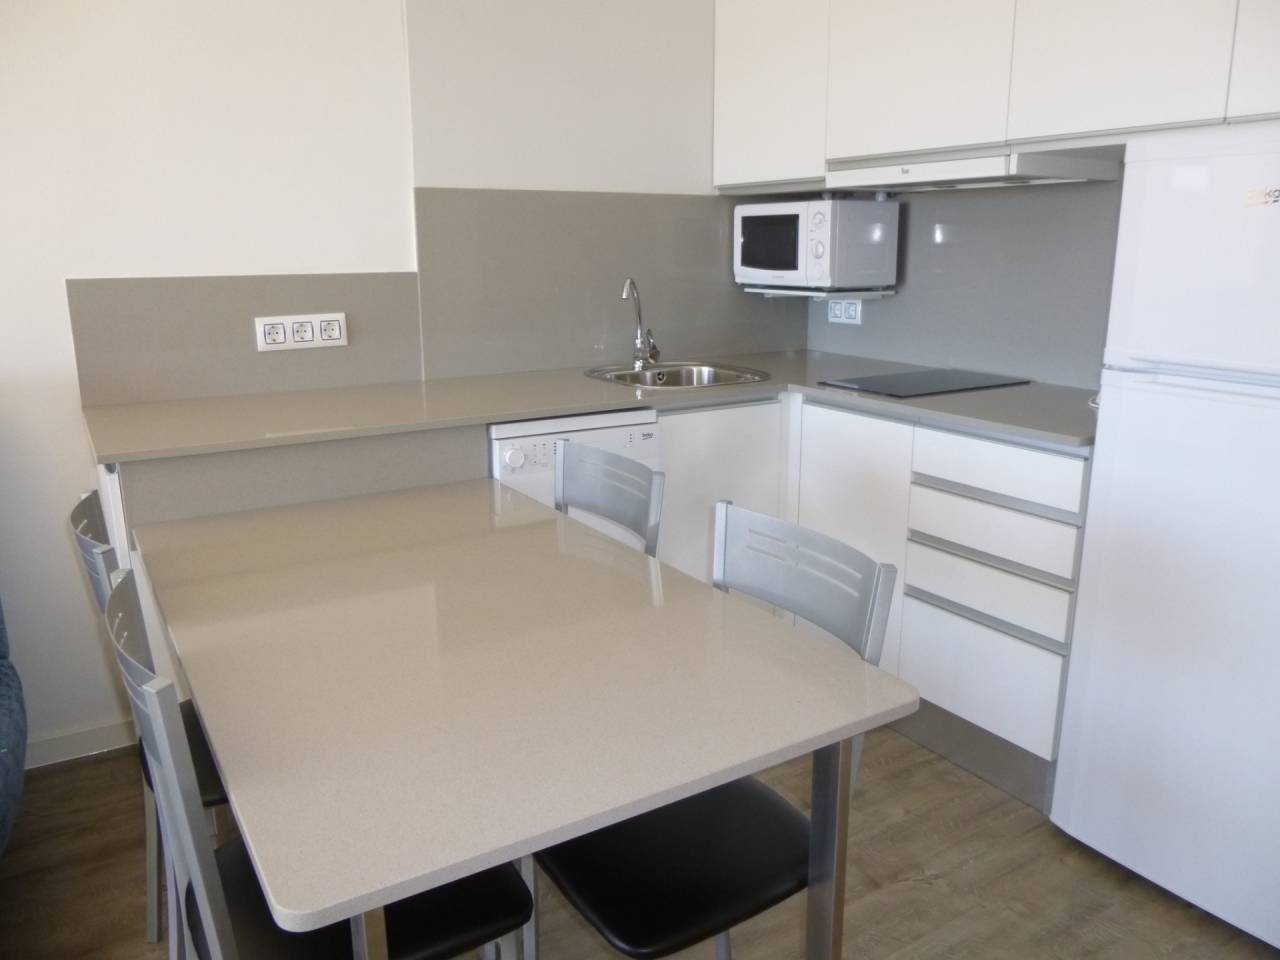 880023 - Apartment for short-term rental in Empuriabrava